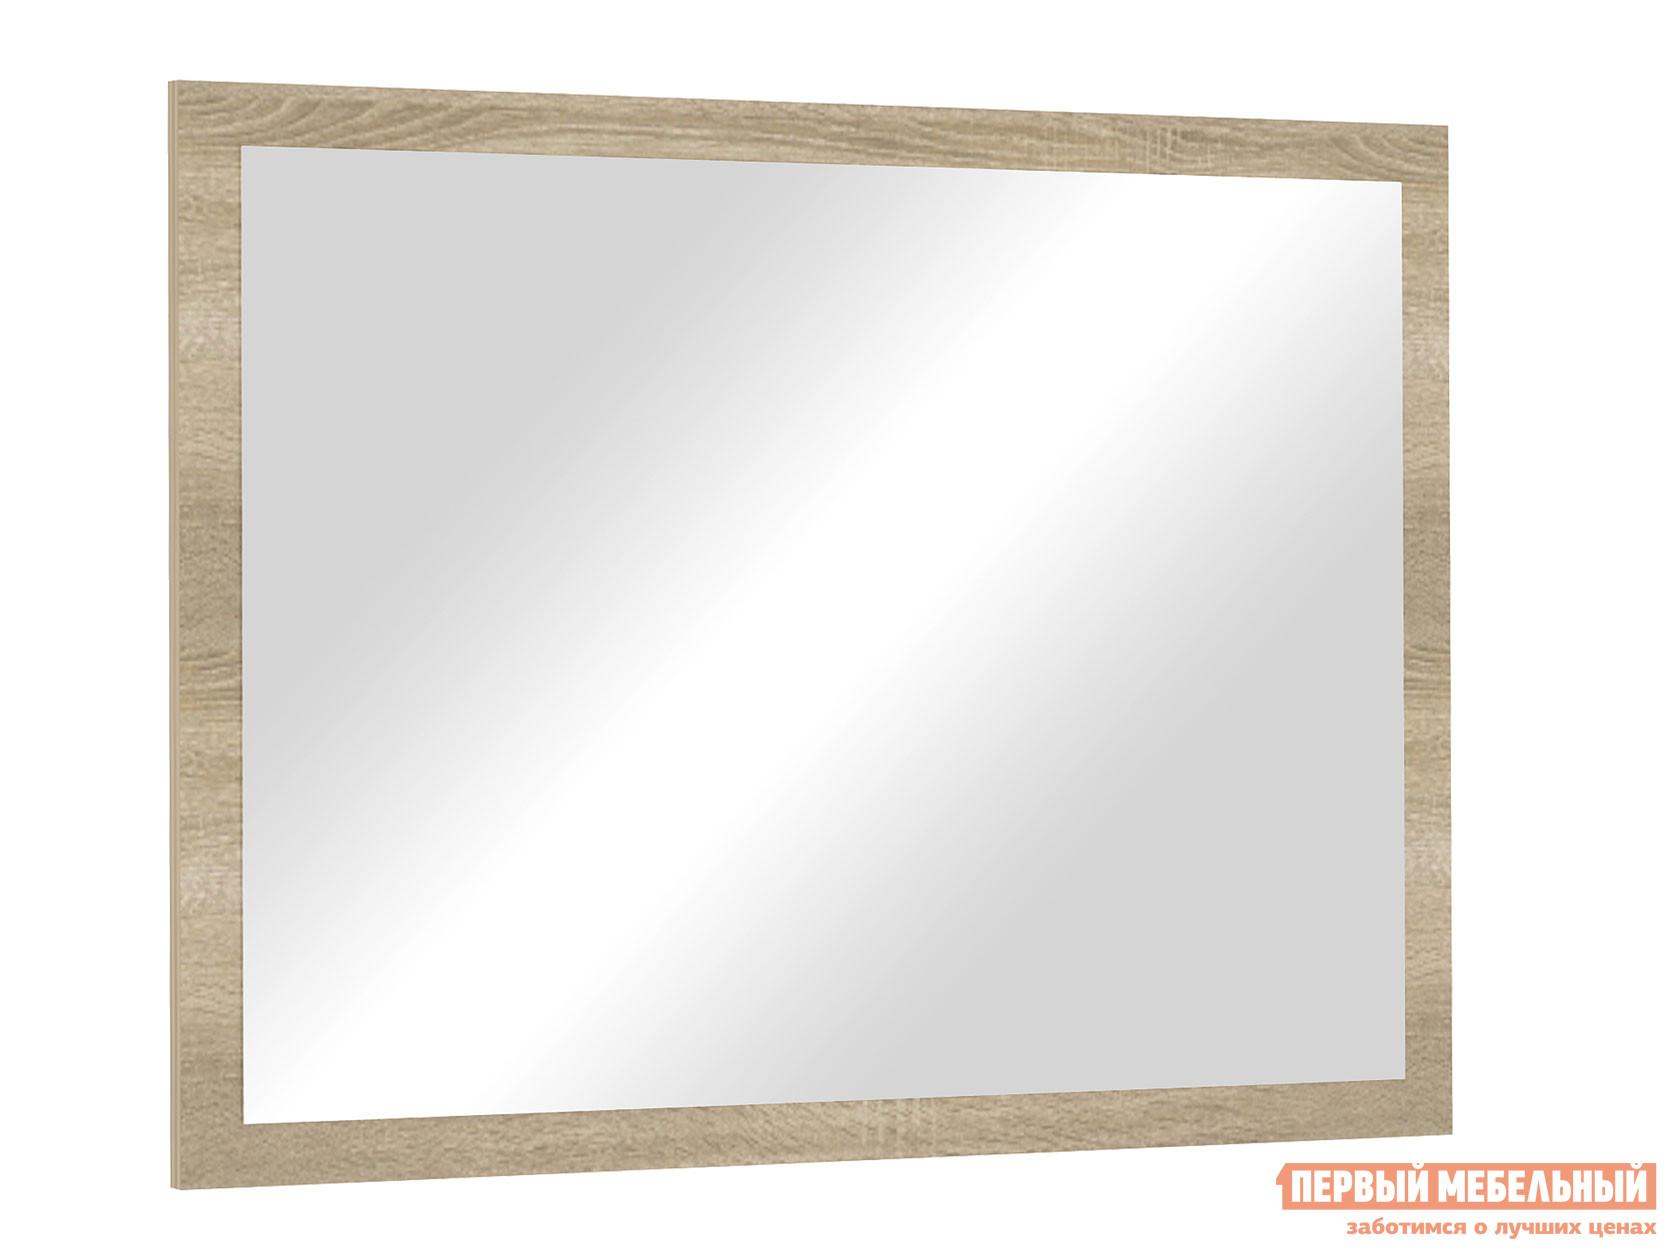 Настенное зеркало НК-Мебель БЛАНКА зеркало 72250069